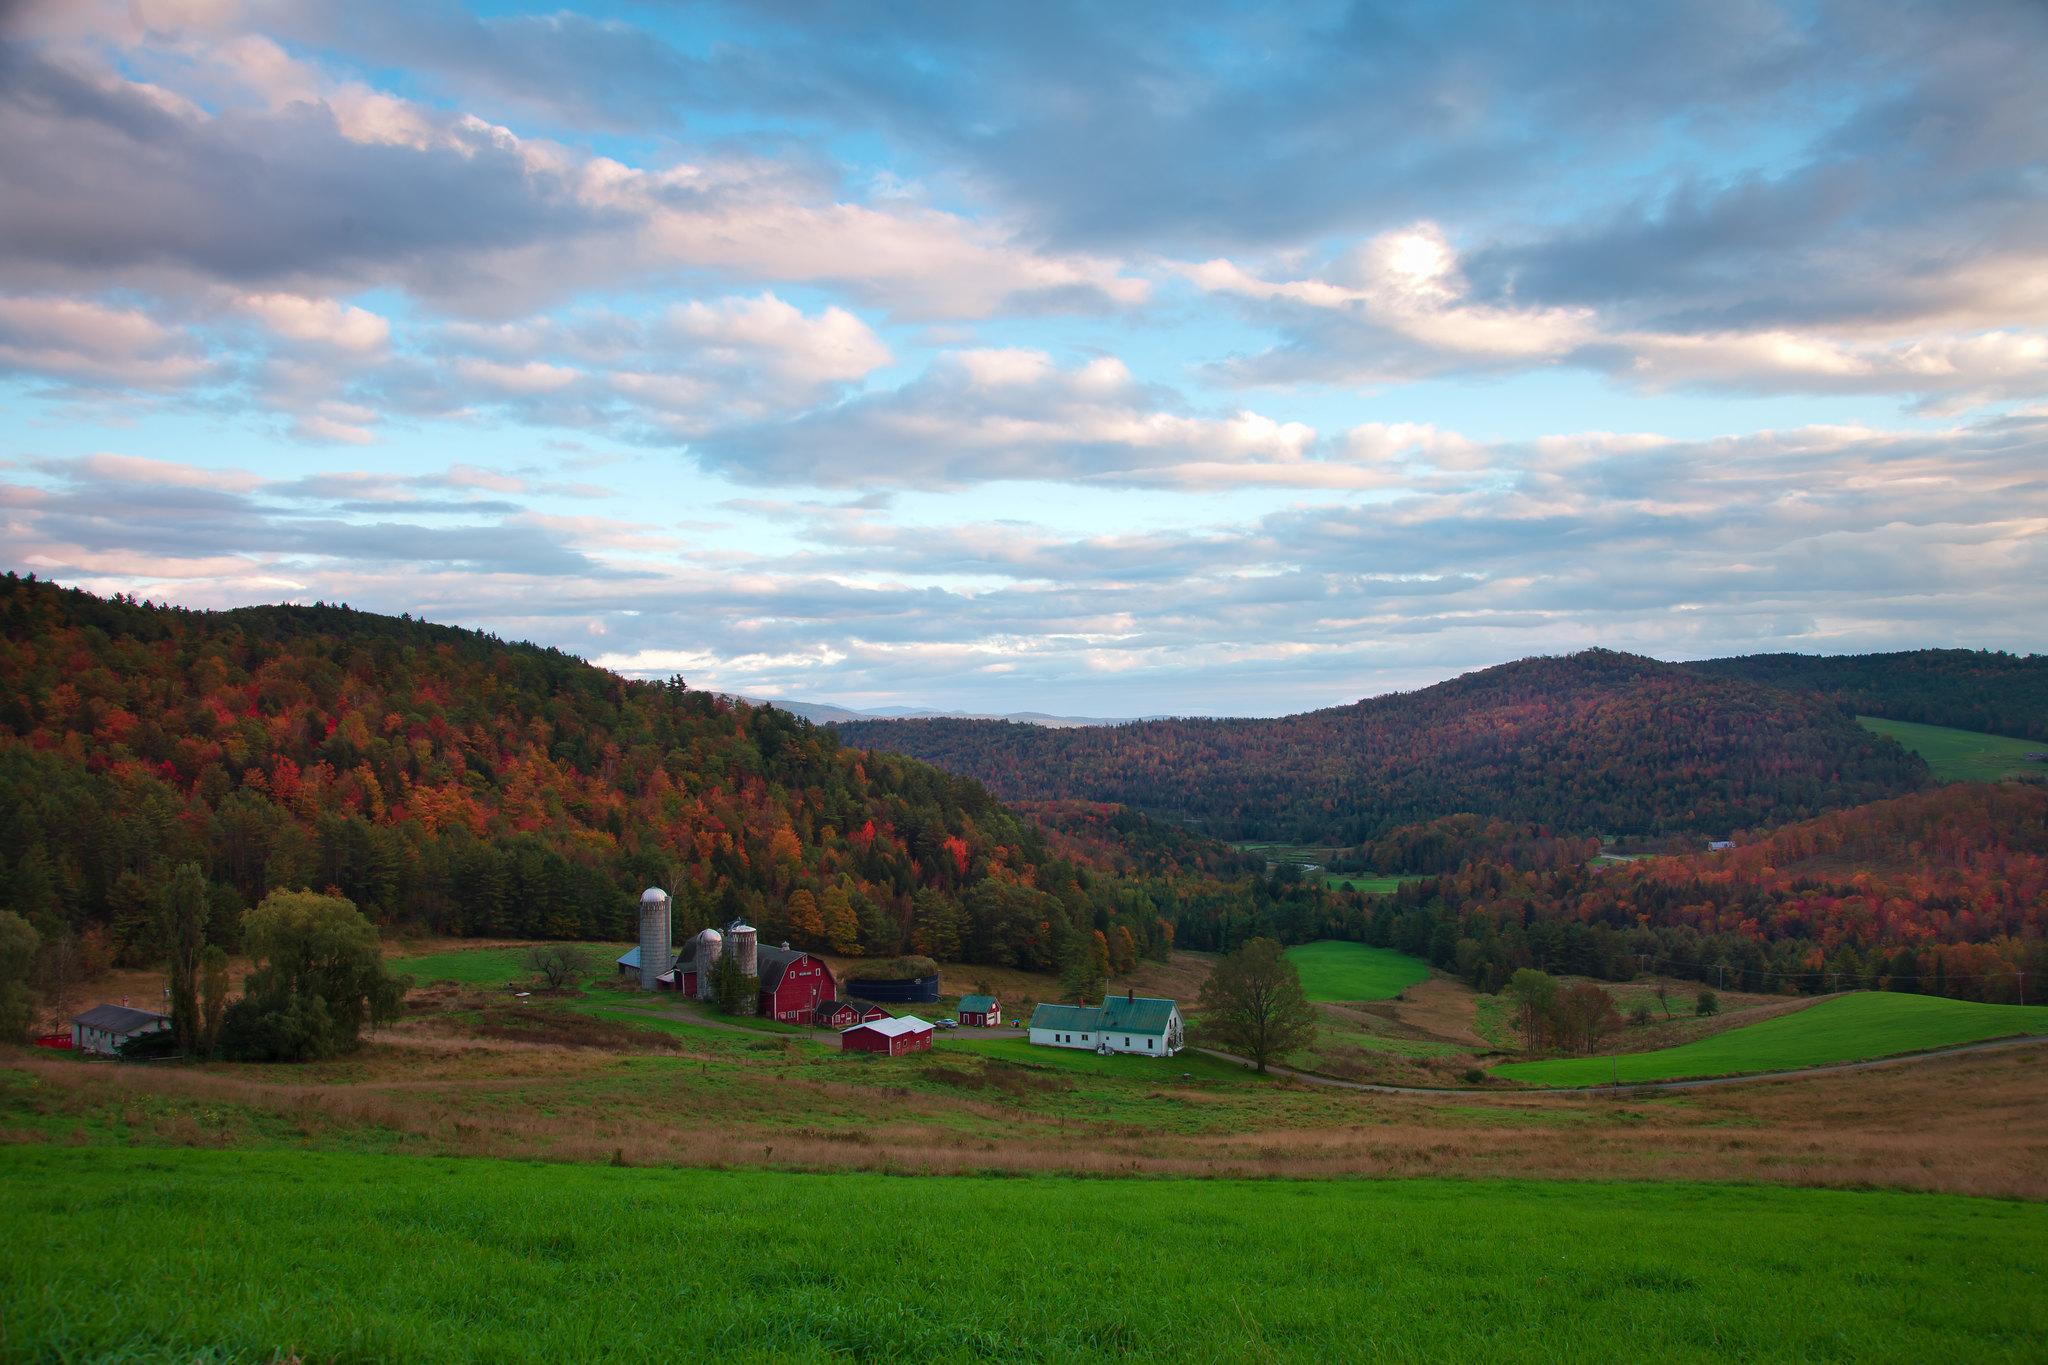 'Fall Time', Vermont, Danville Area, Barnet Center Road, Countryside, Farm